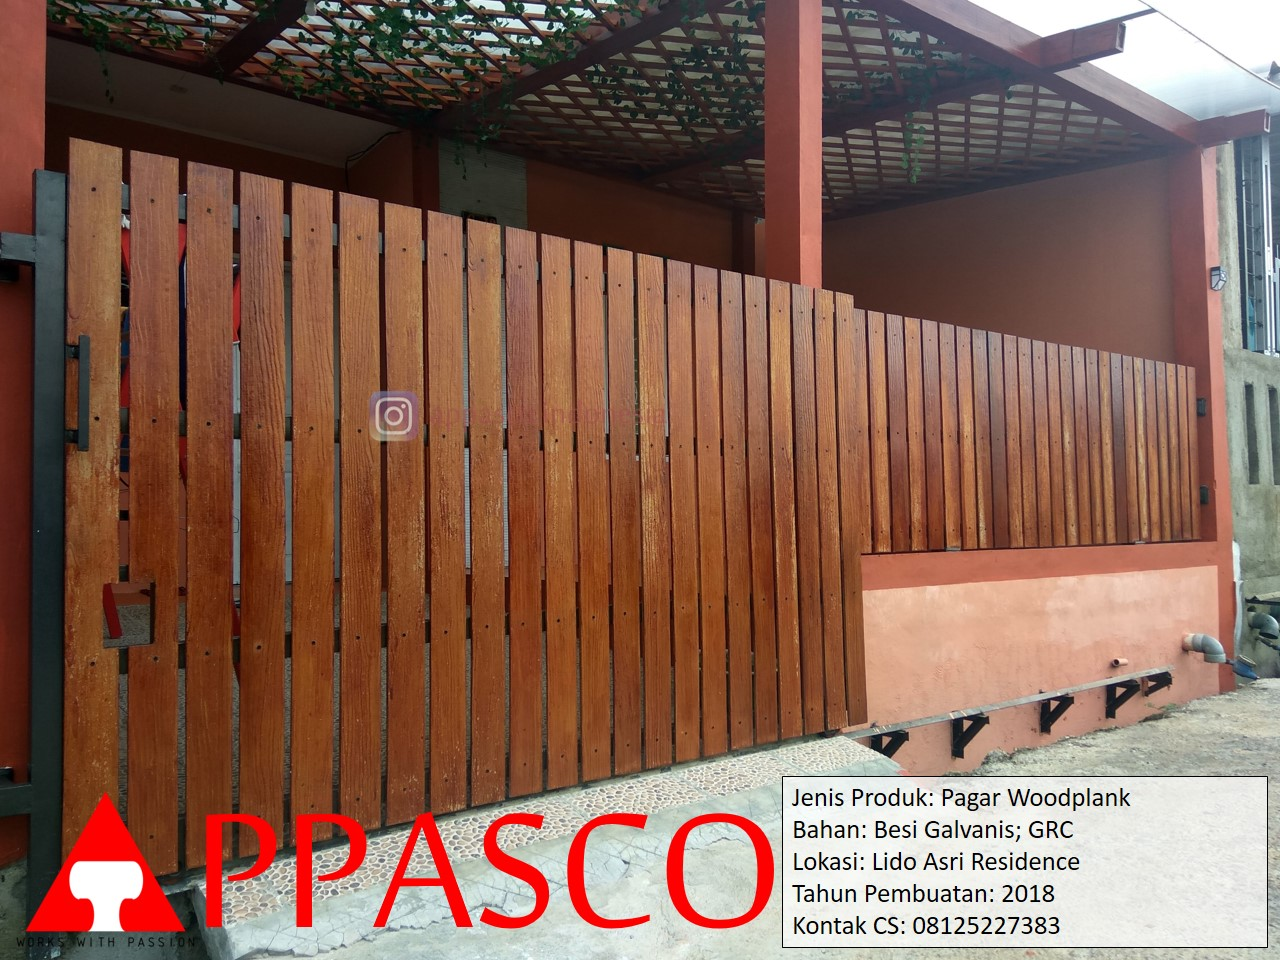 Wood Plank GRC Pagar Motif Kayu di Lido Asri Residence